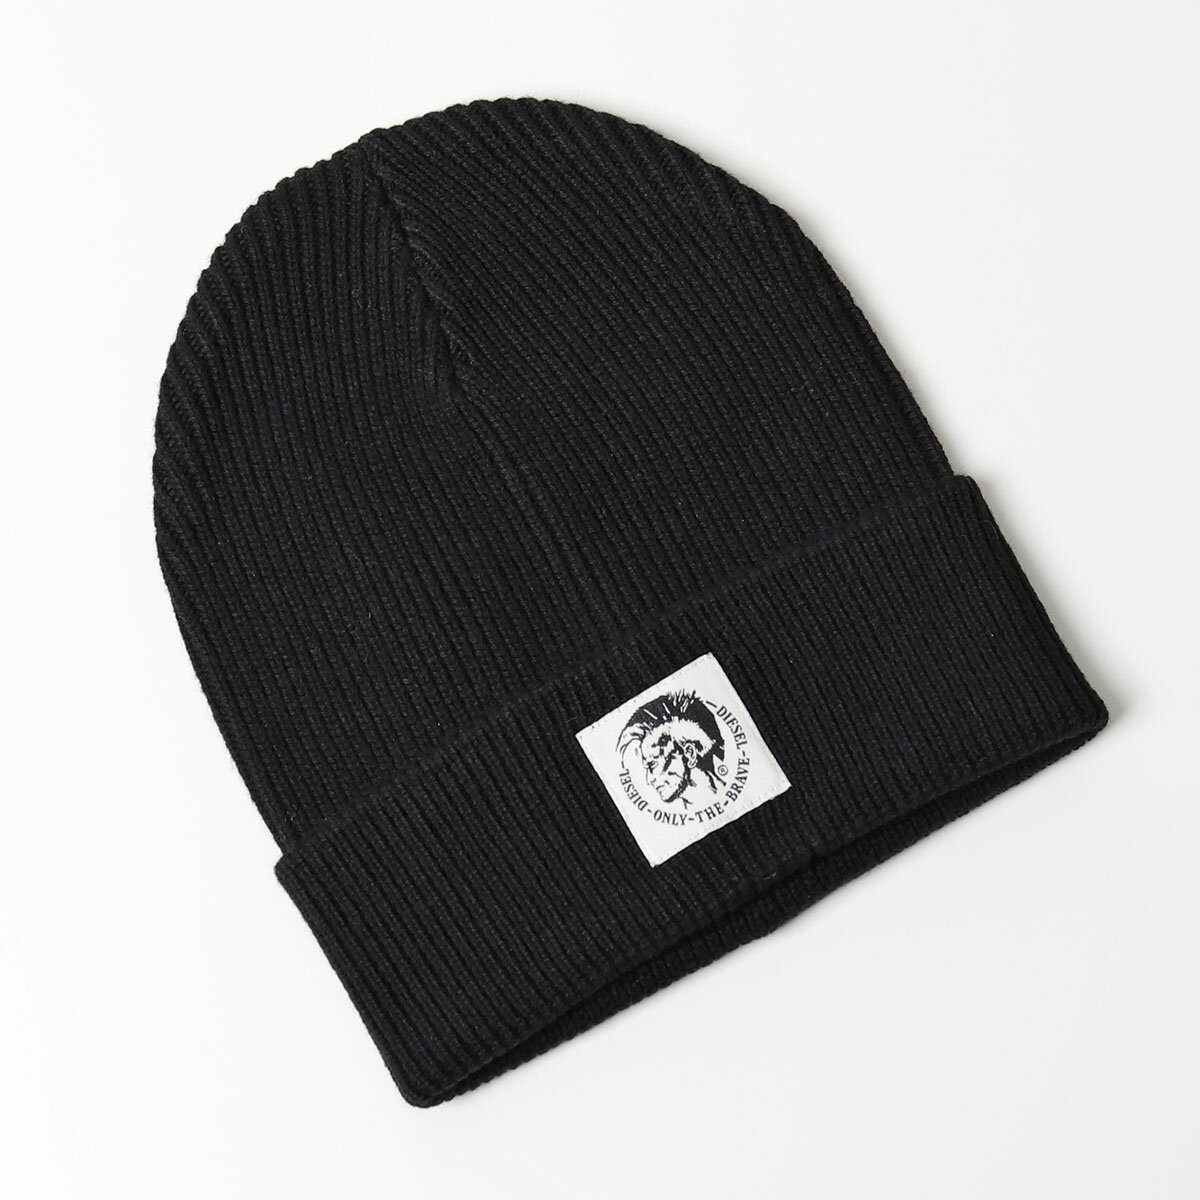 DIESEL ディーゼル 00SVEX 0DAOB K-CODER CAP ウールコットン ニットキャップ ニット帽 リブ 帽子 ブレイブマン パッチ カラー900/ブラック 9504メンズ